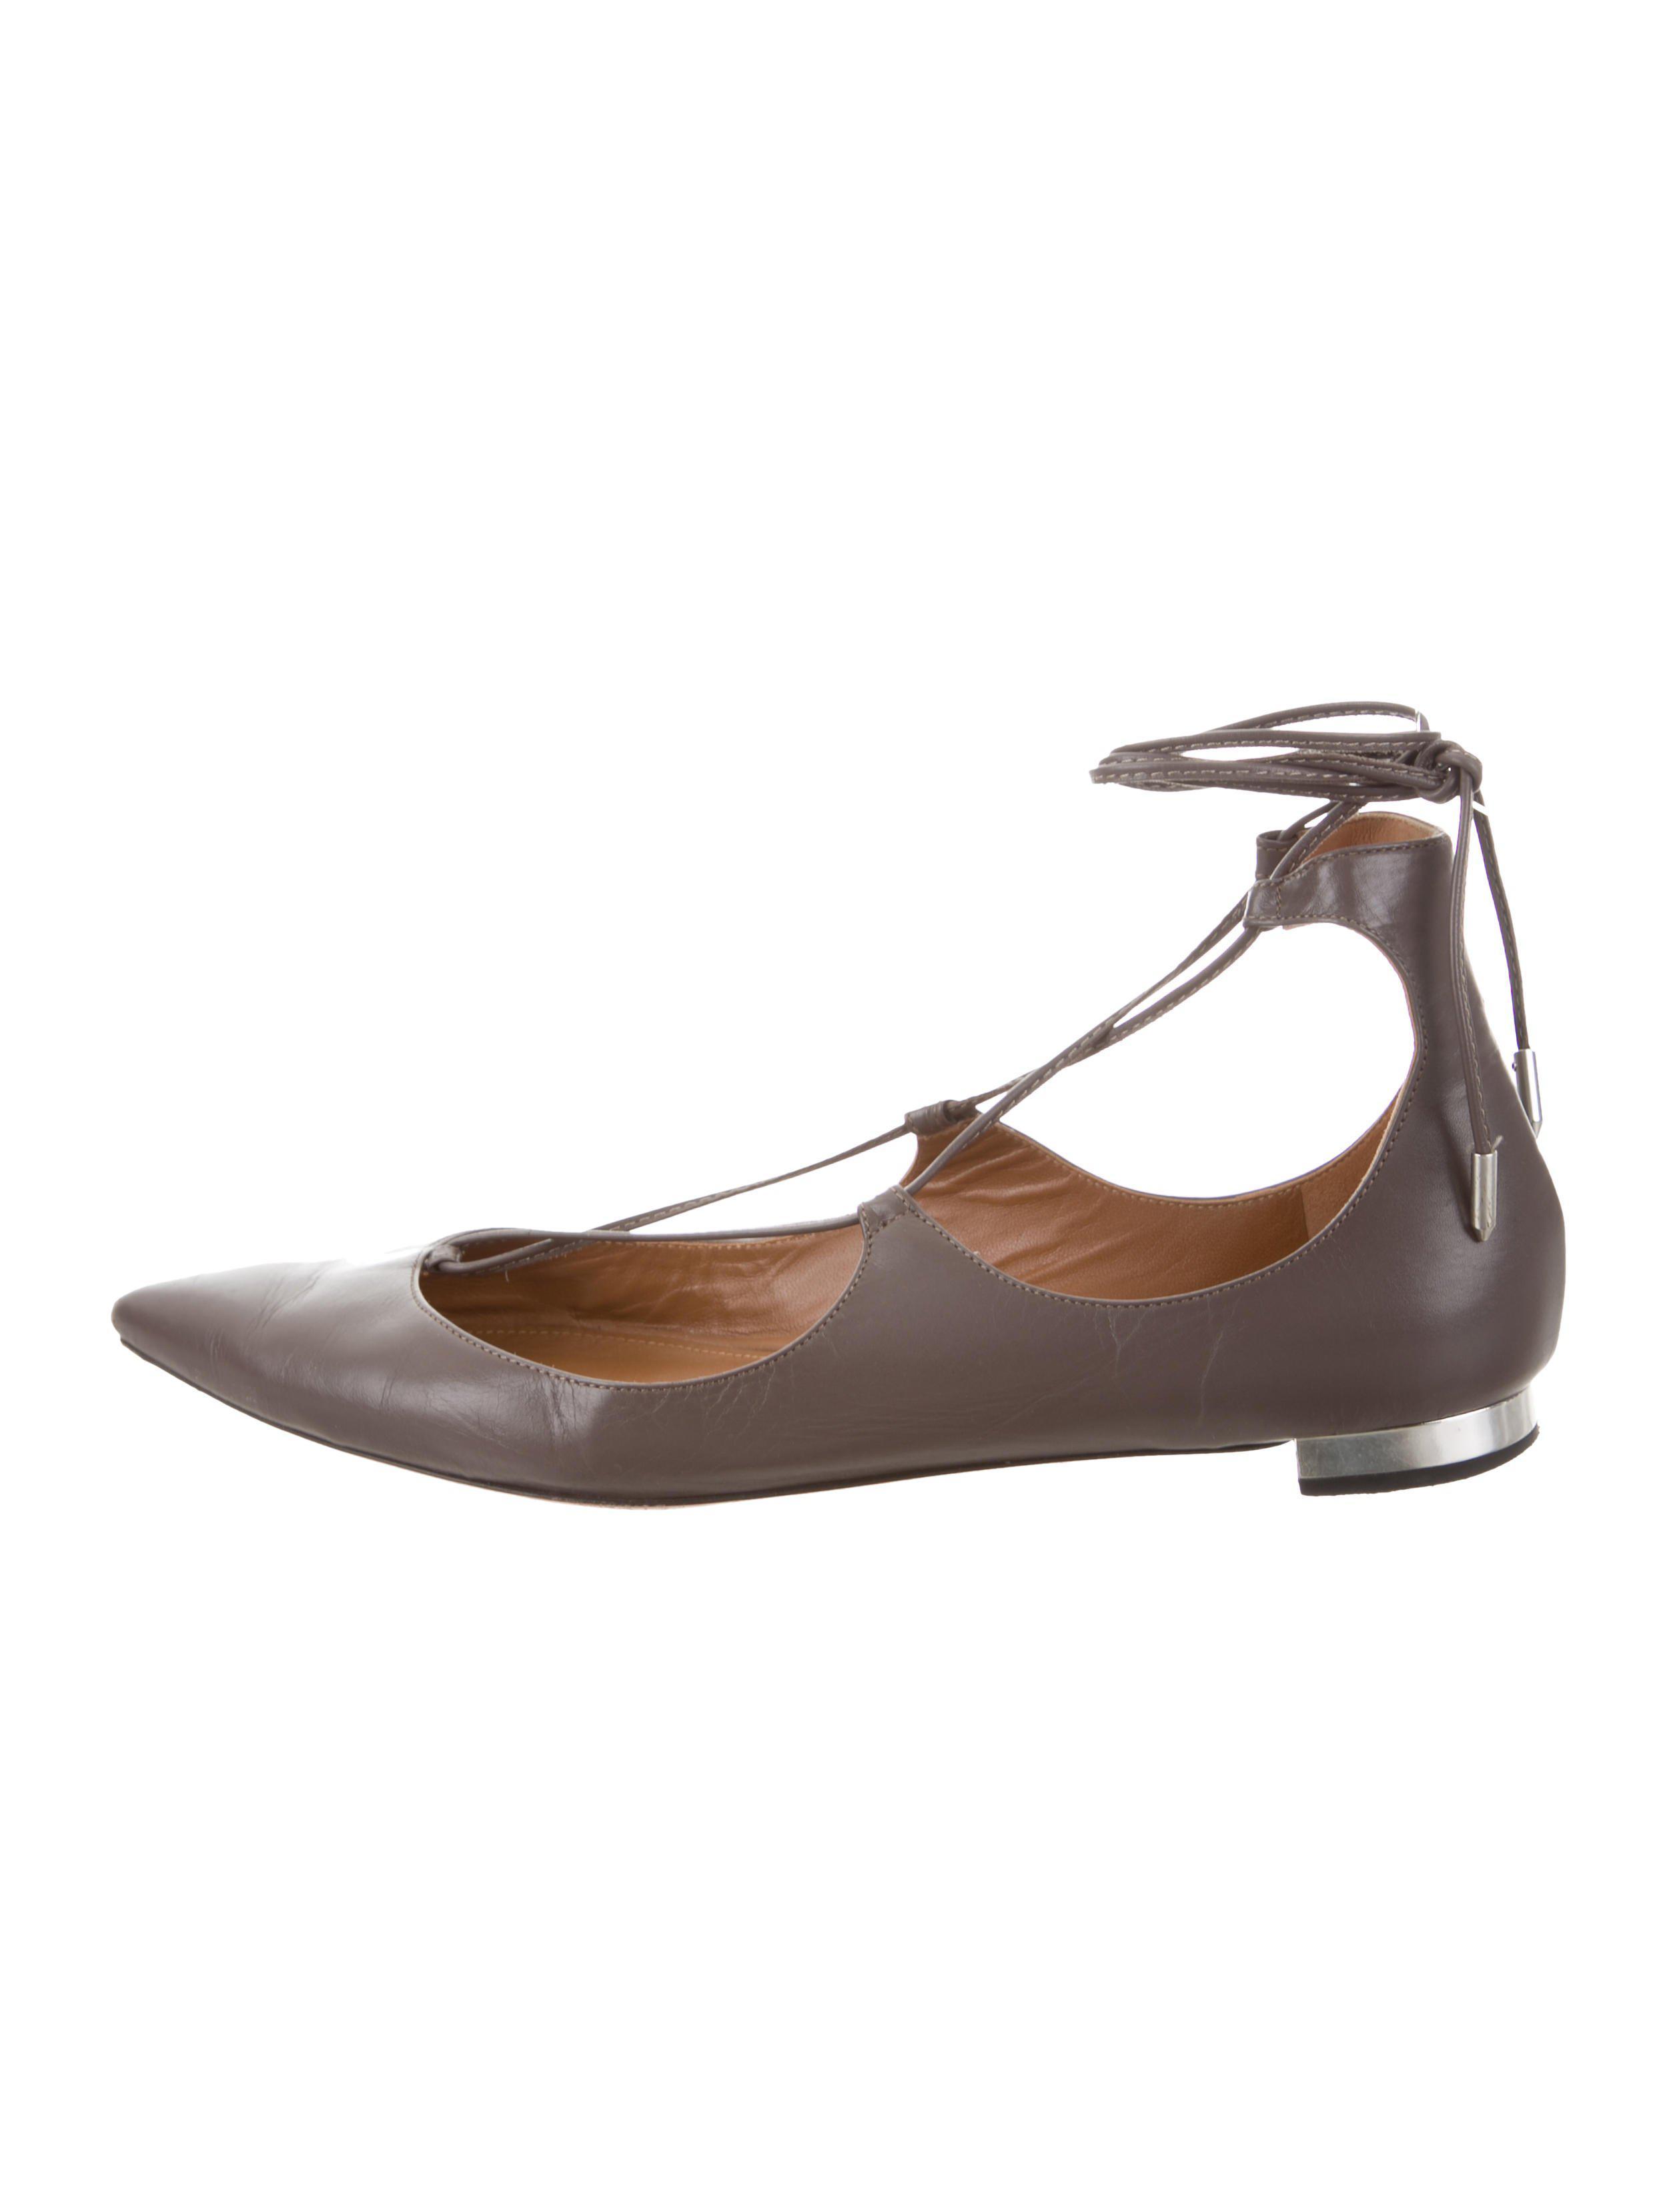 nicekicks cheap online best for sale Aquazzura Leather Wrap-Around Flats sneakernews cheap online QtCgVZY